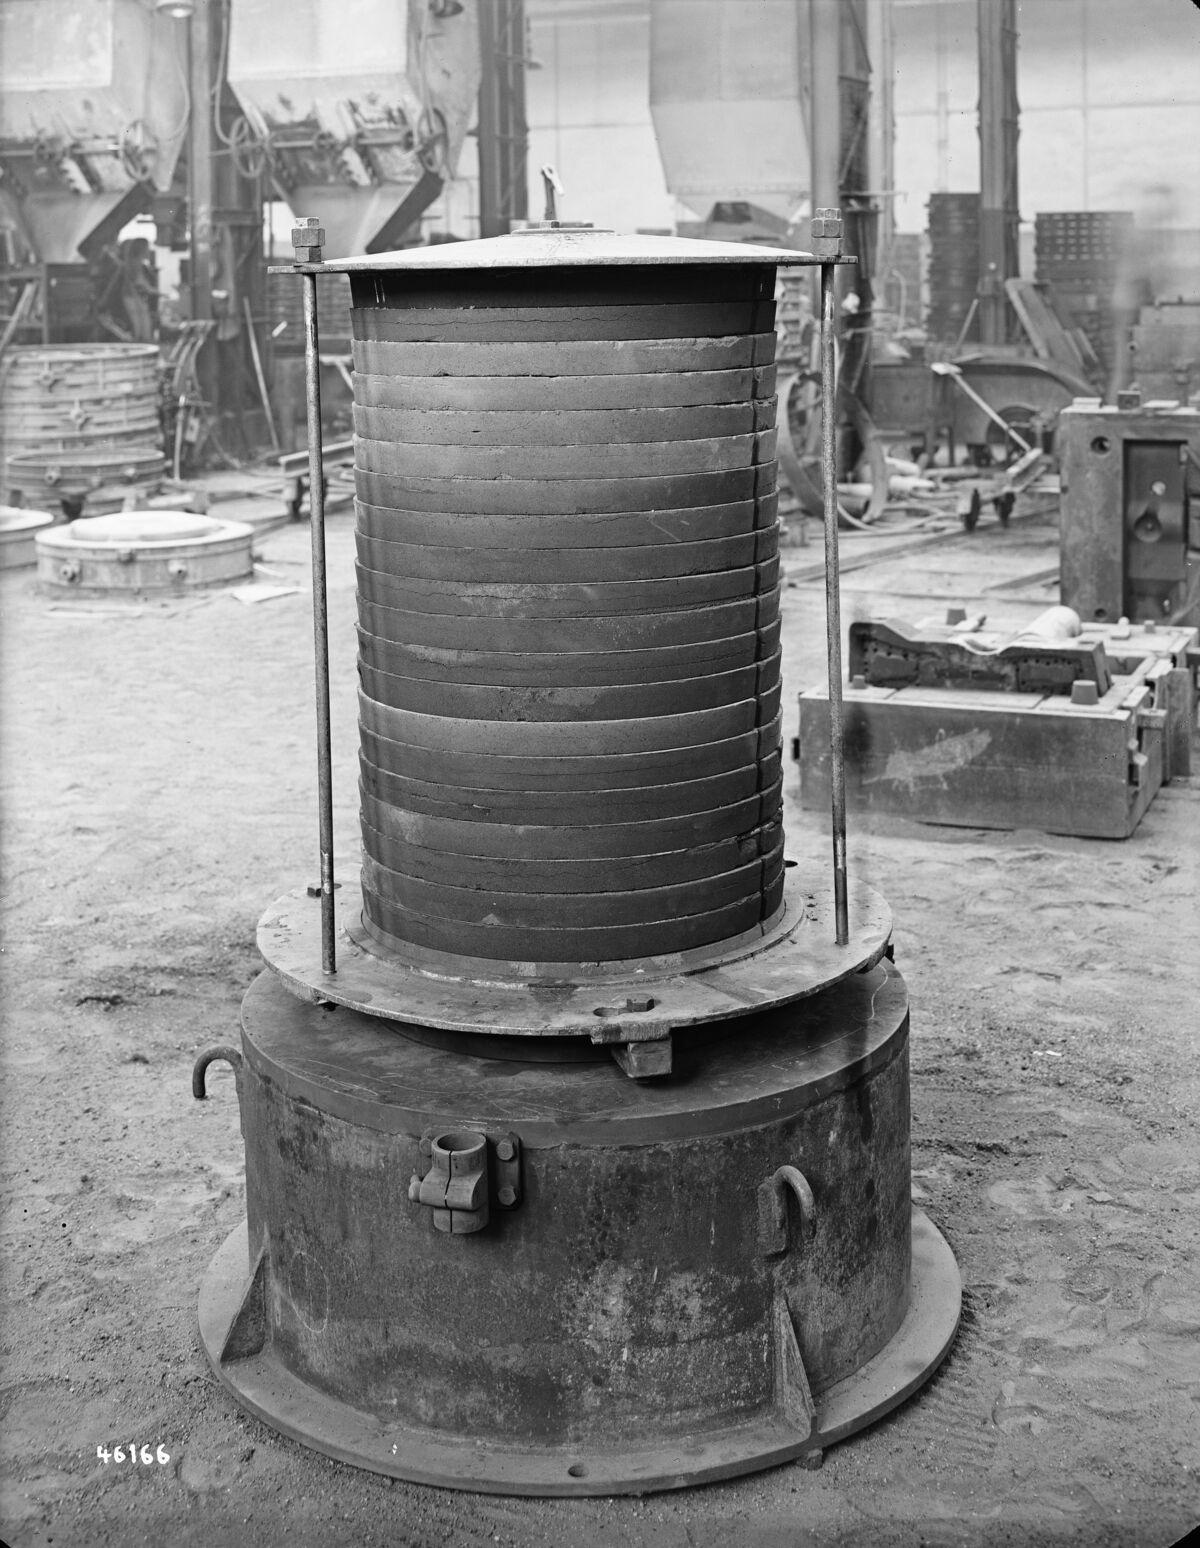 GFA 16/46166: Clamp rings for turbine BBC